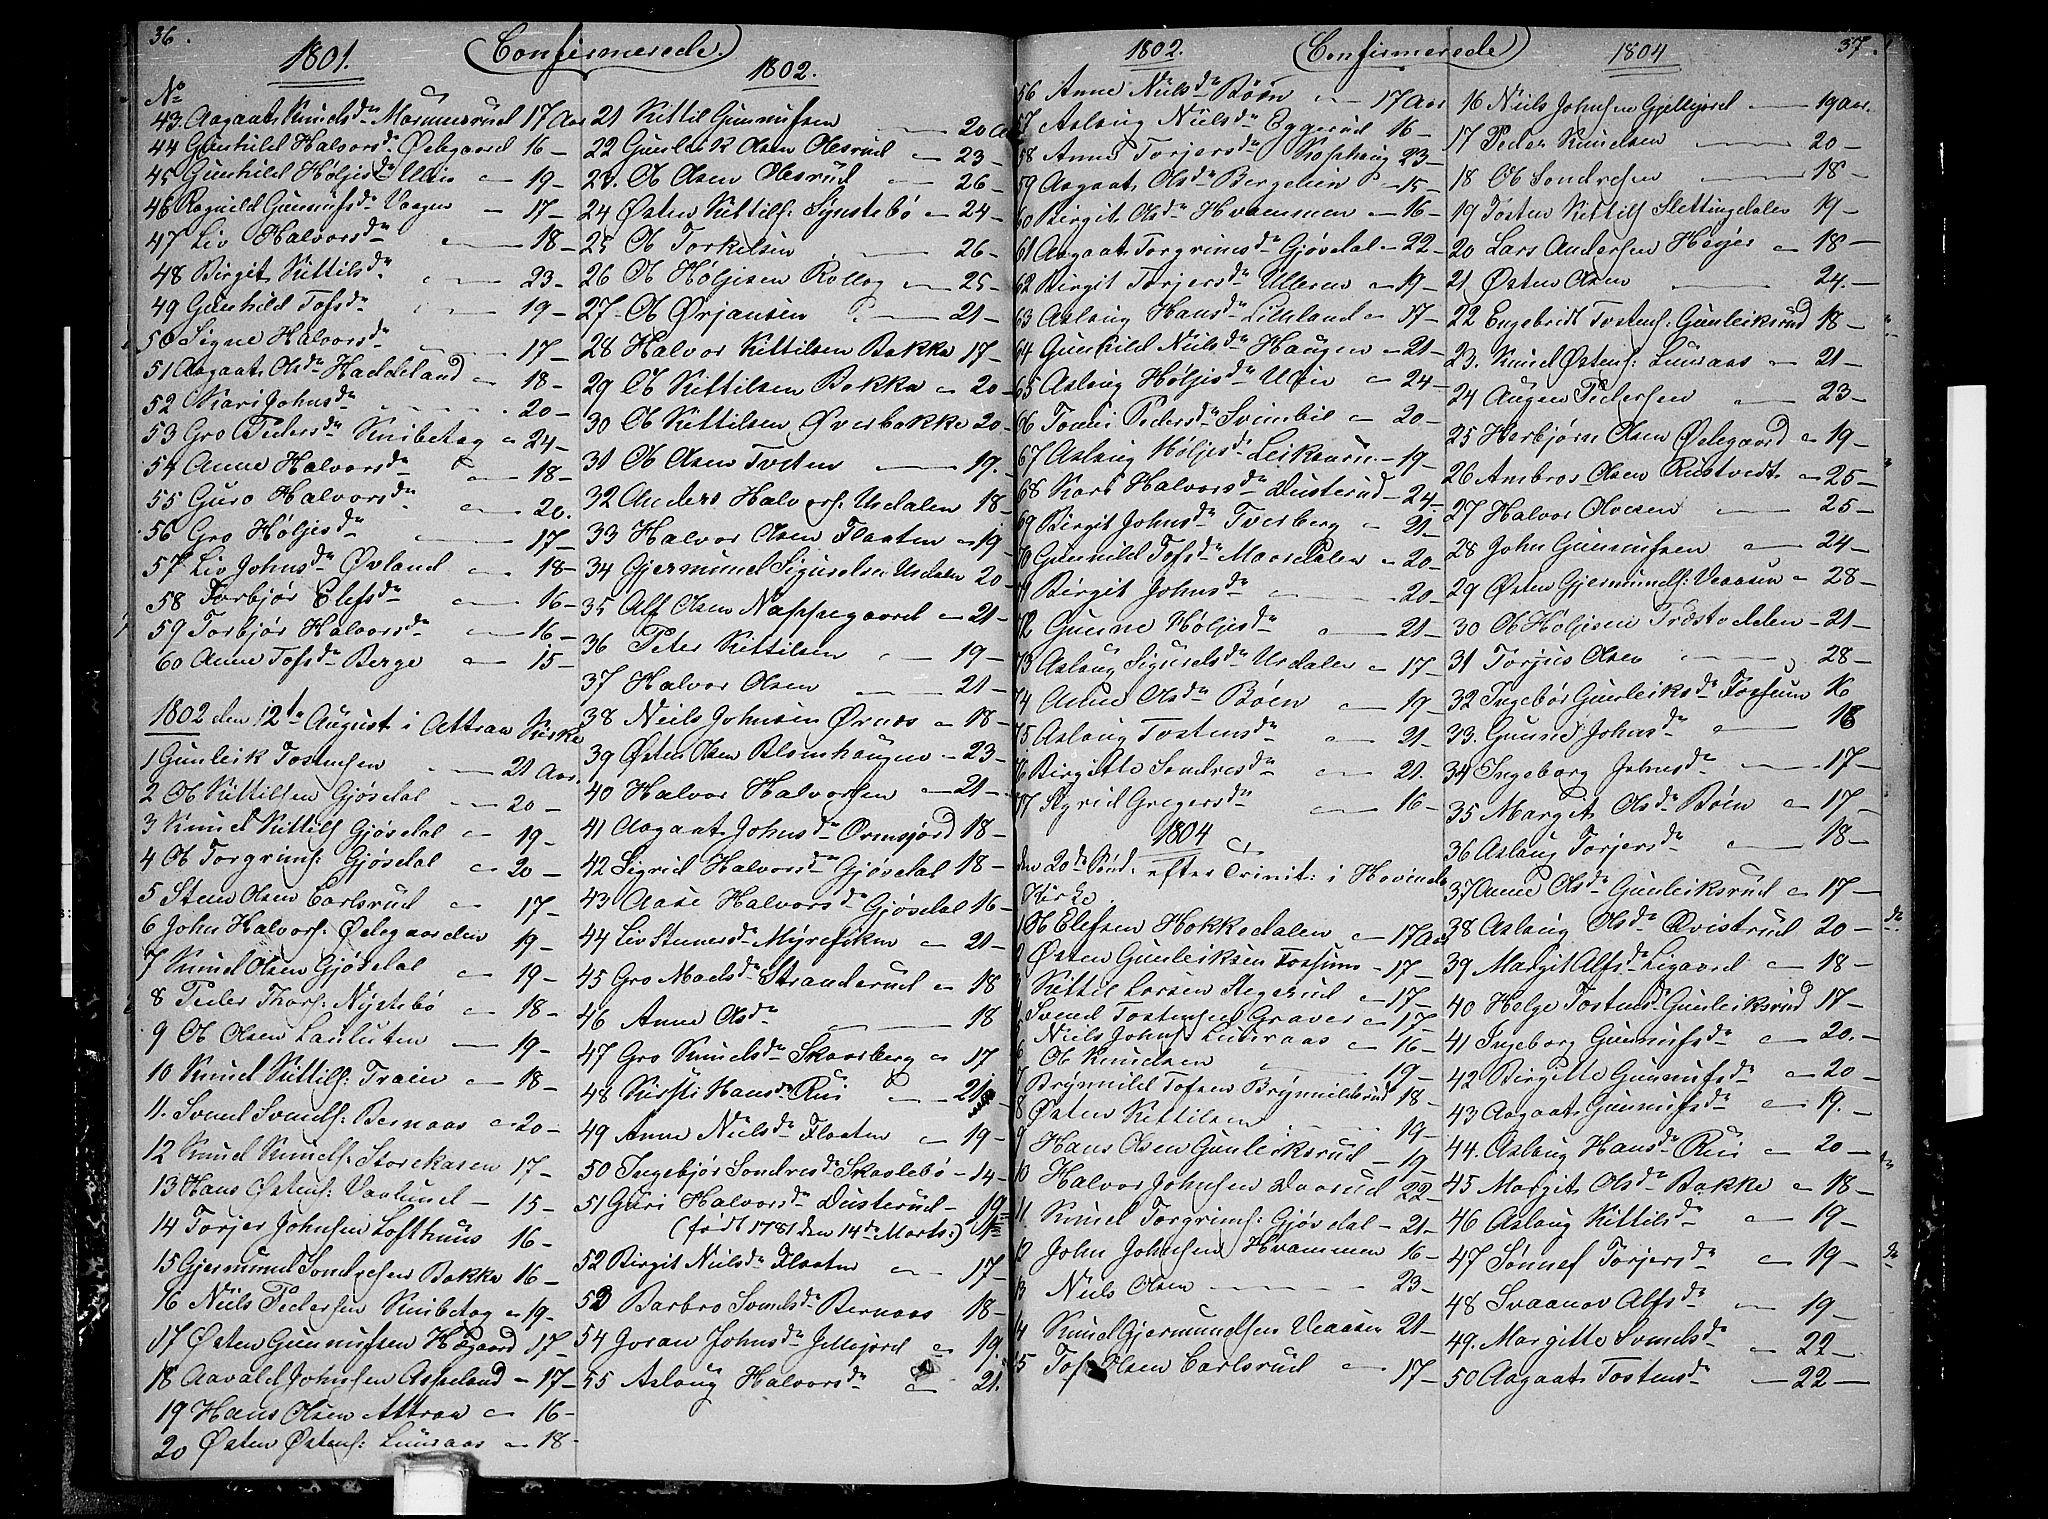 SAKO, Gransherad kirkebøker, F/Fb/L0001: Ministerialbok nr. II 1, 1800-1814, s. 36-37